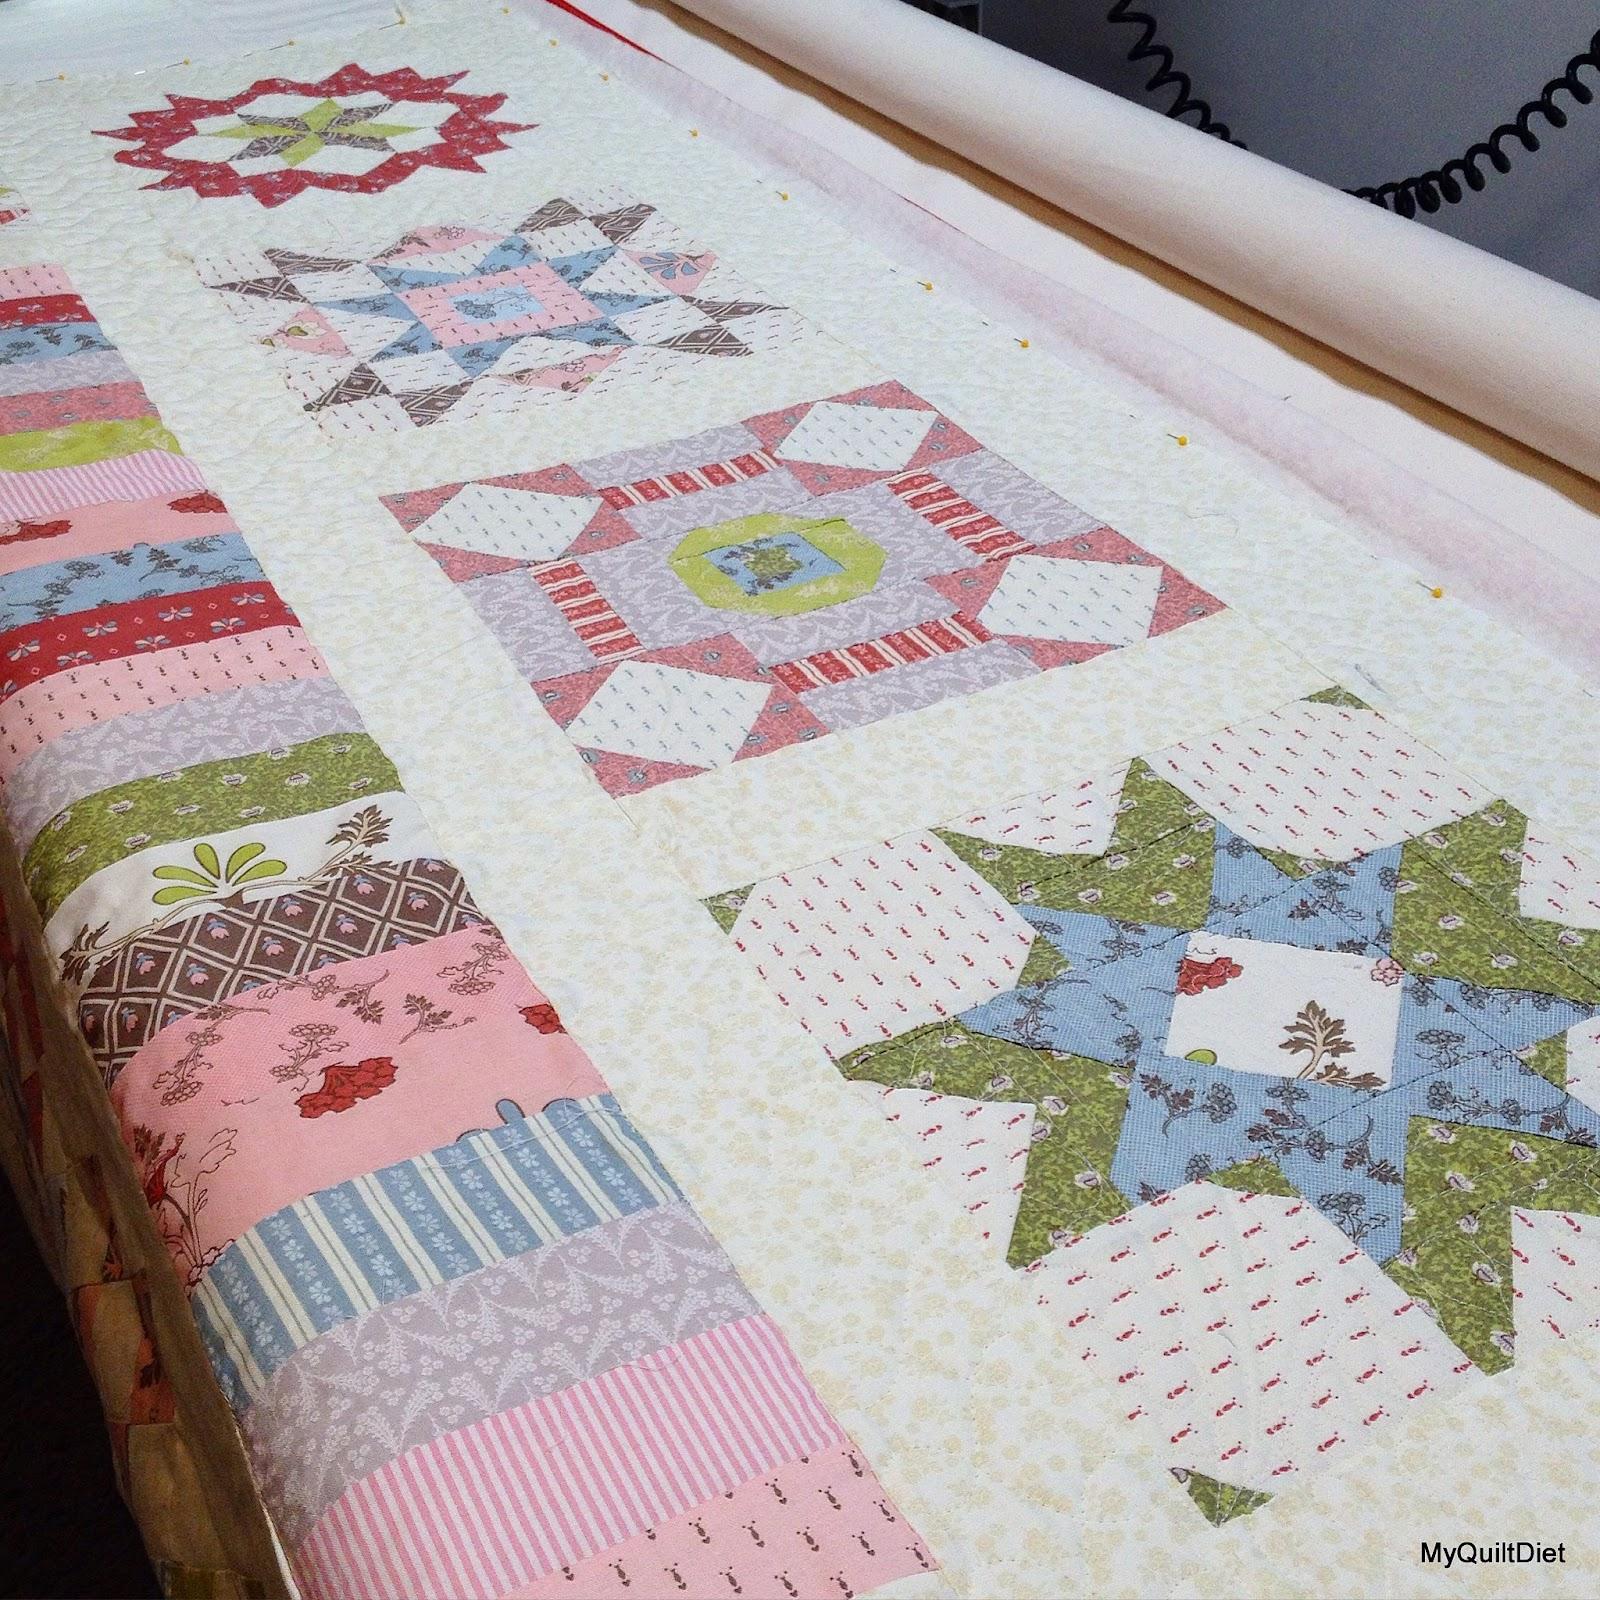 My quilt diet jill 39 s grandmas garden shed quilt for Garden shed quilting